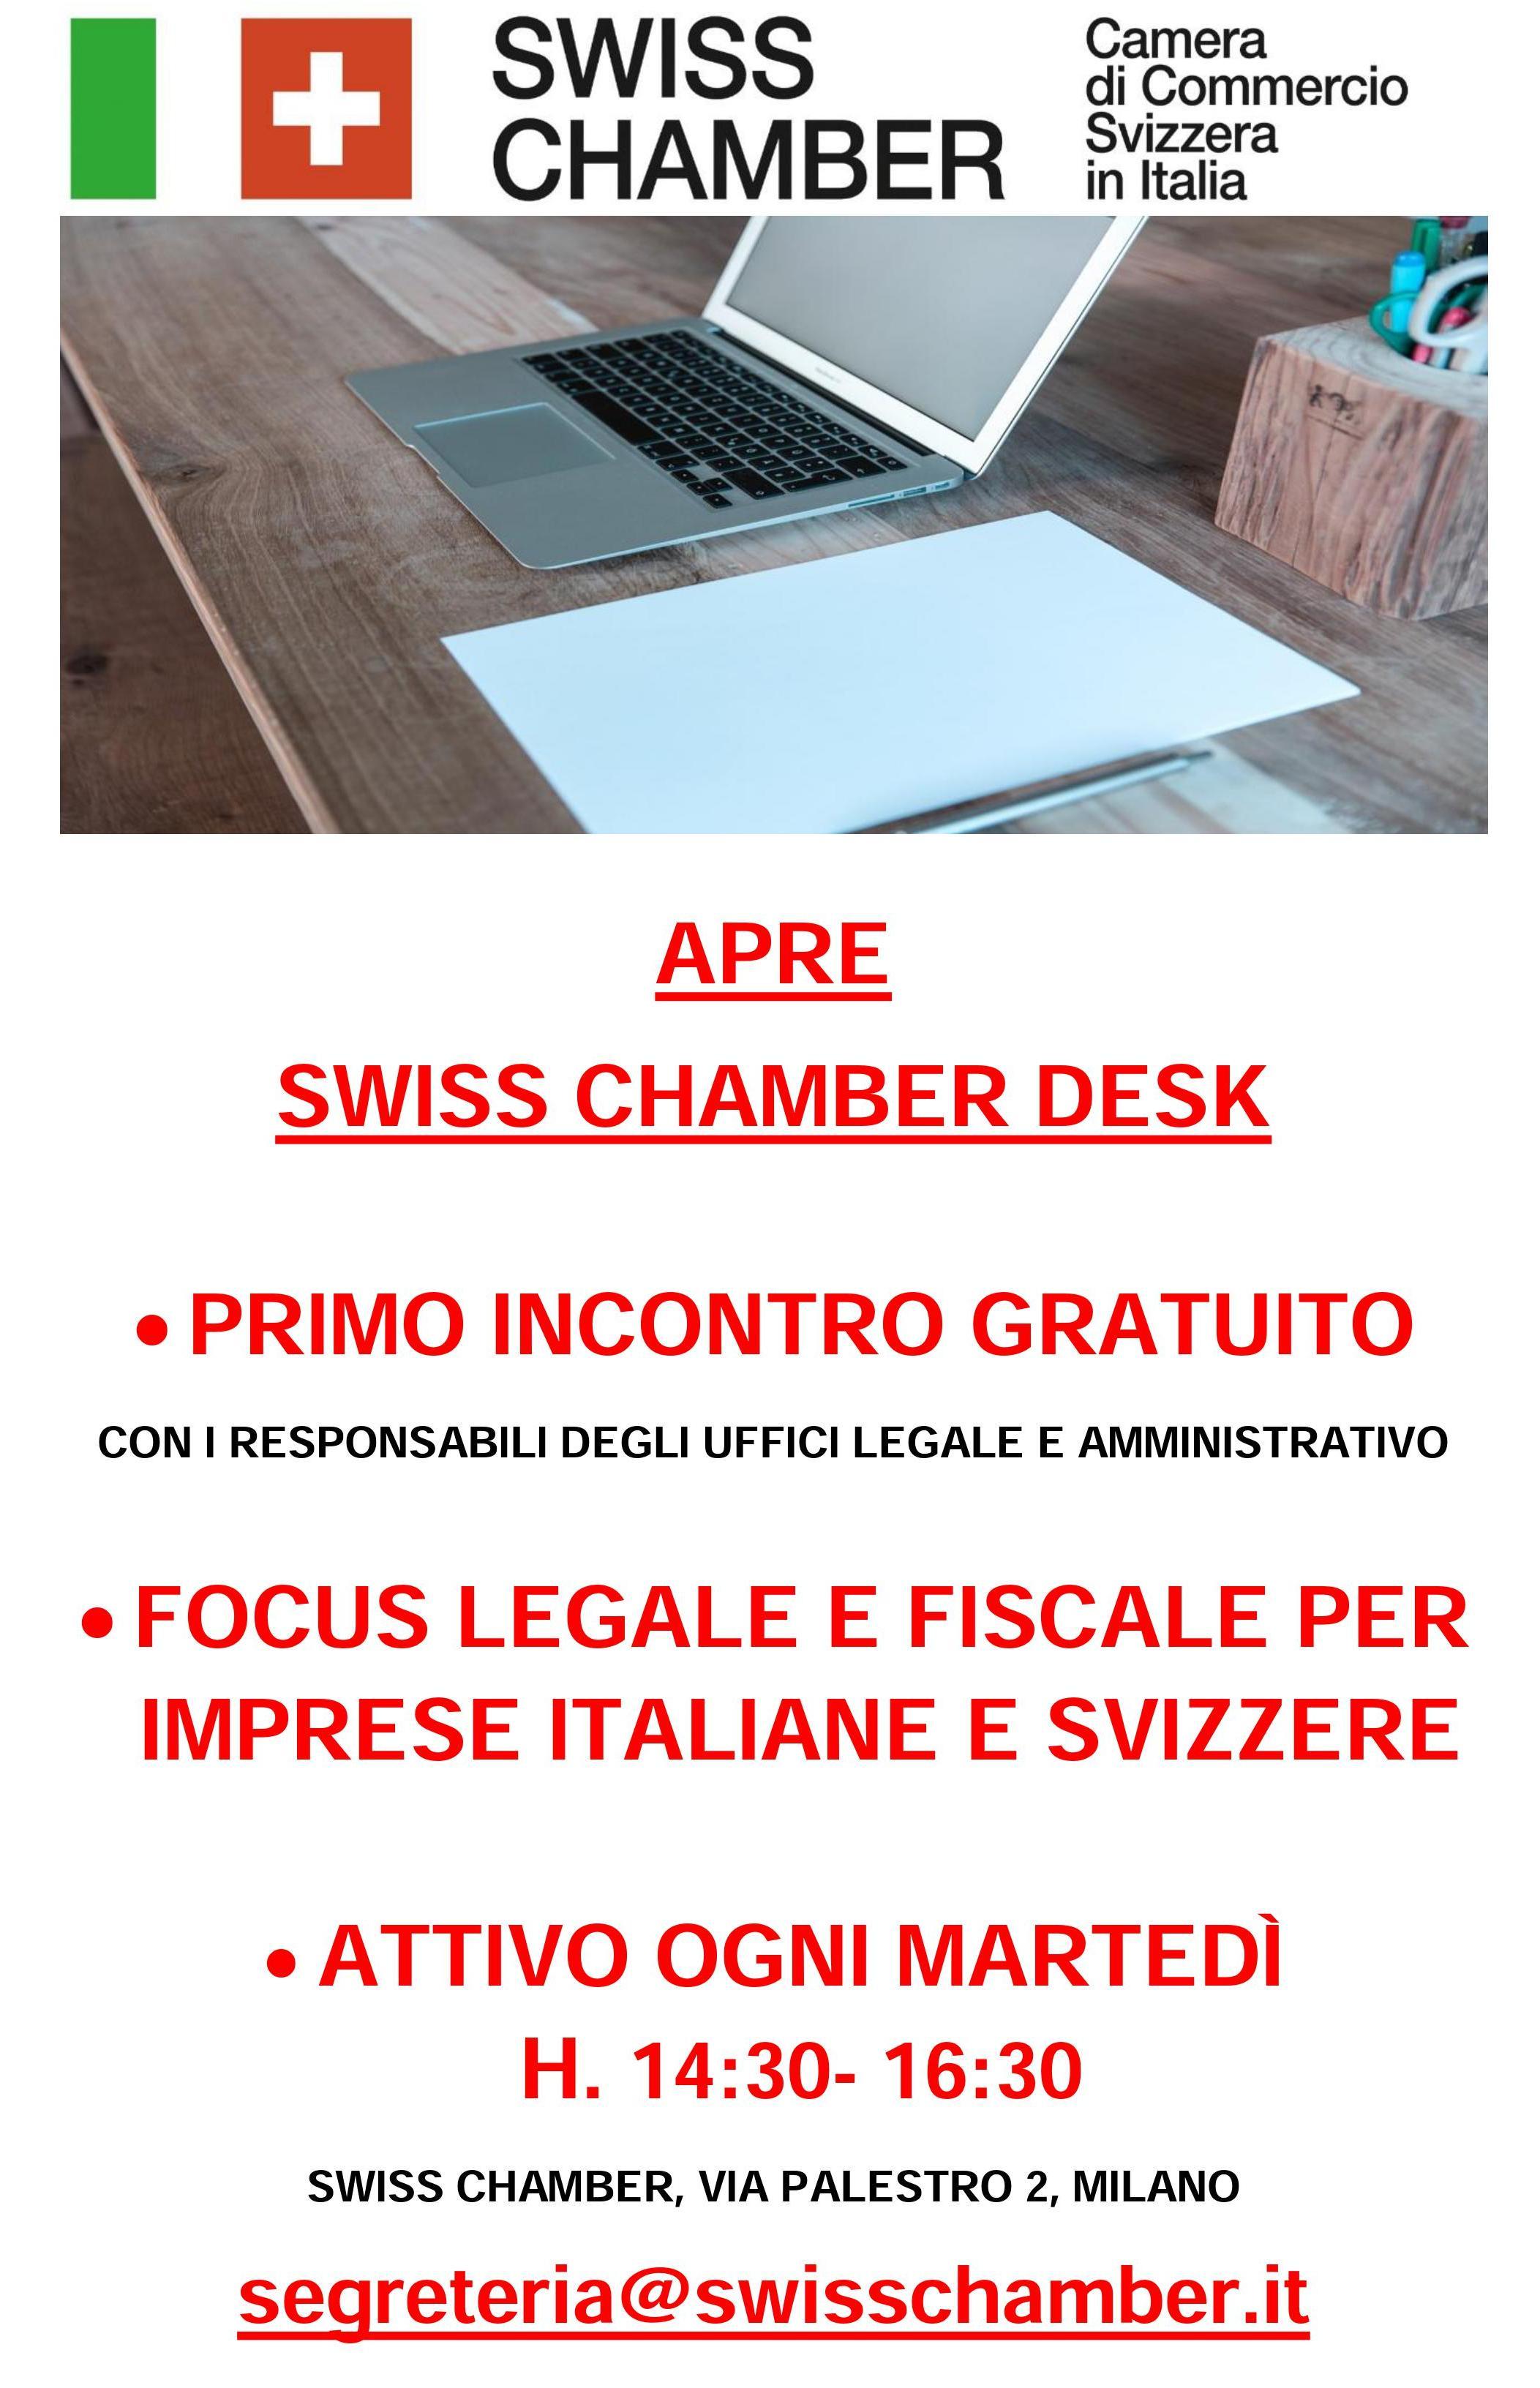 Swiss chamber Desk